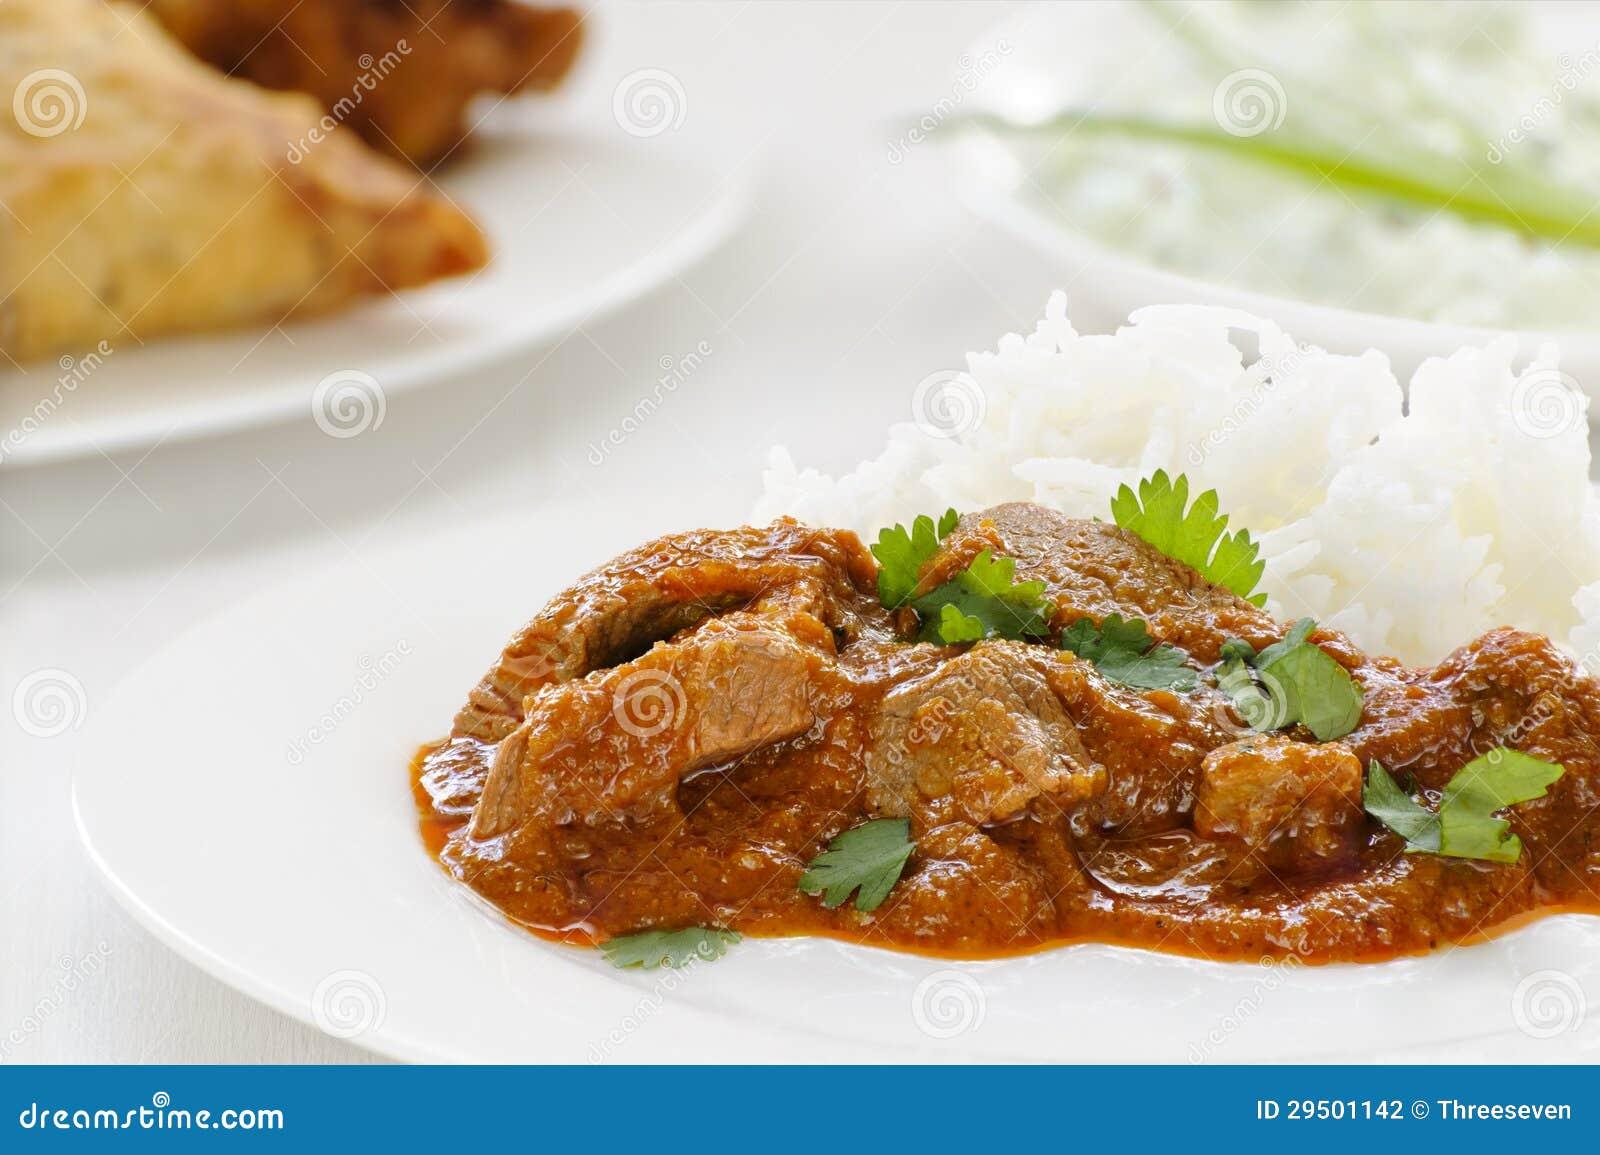 LambMadras curry